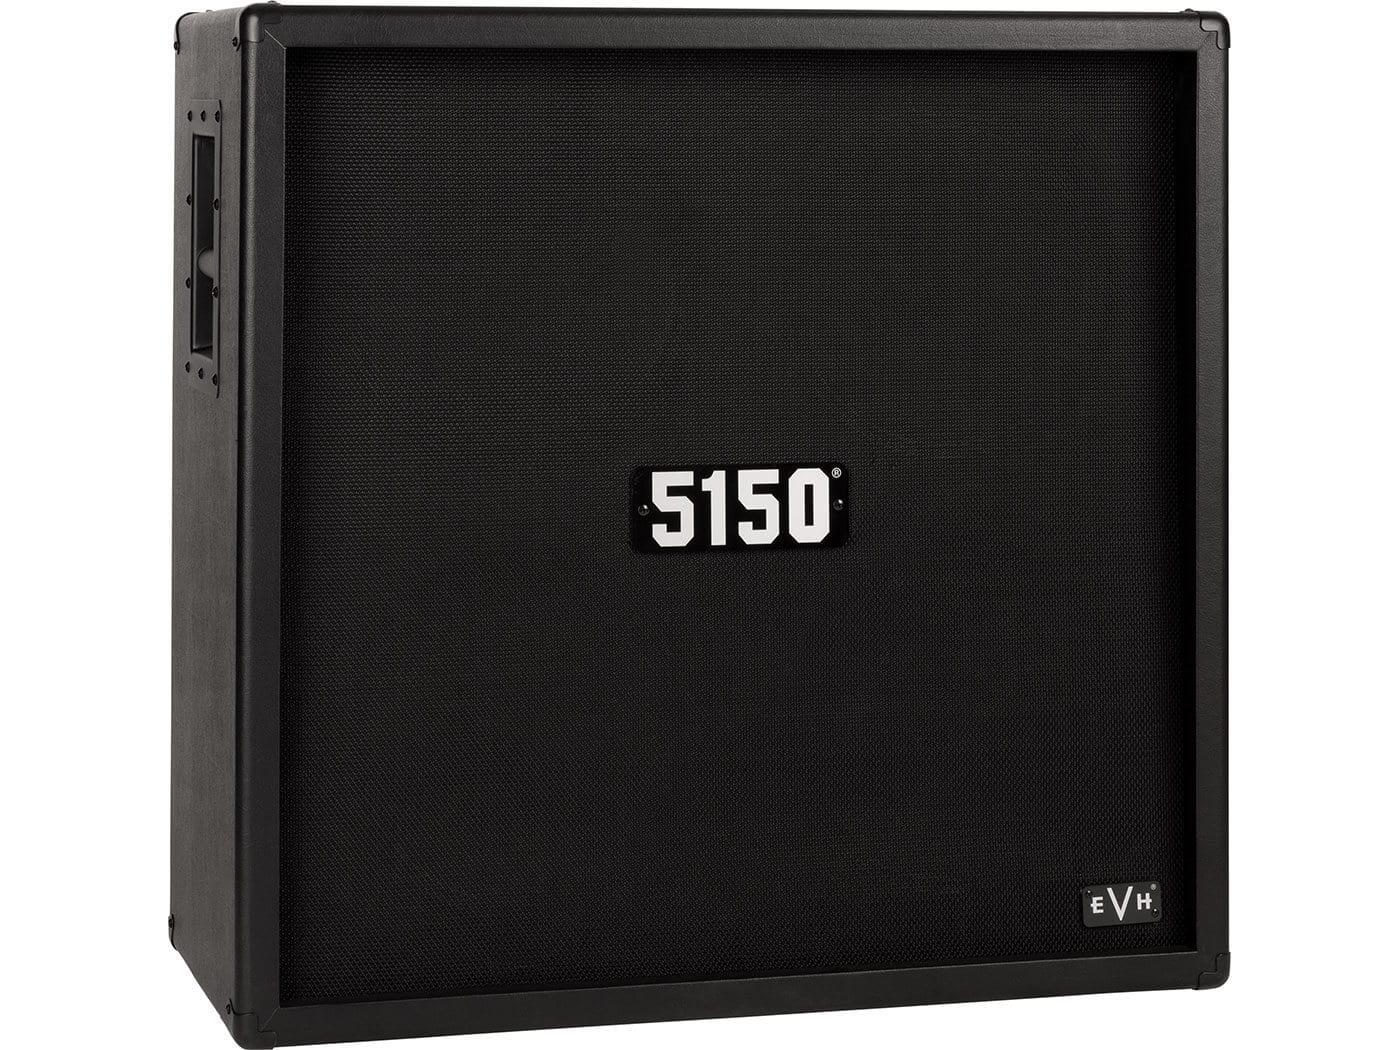 EVH 5150 4x12 cabinet